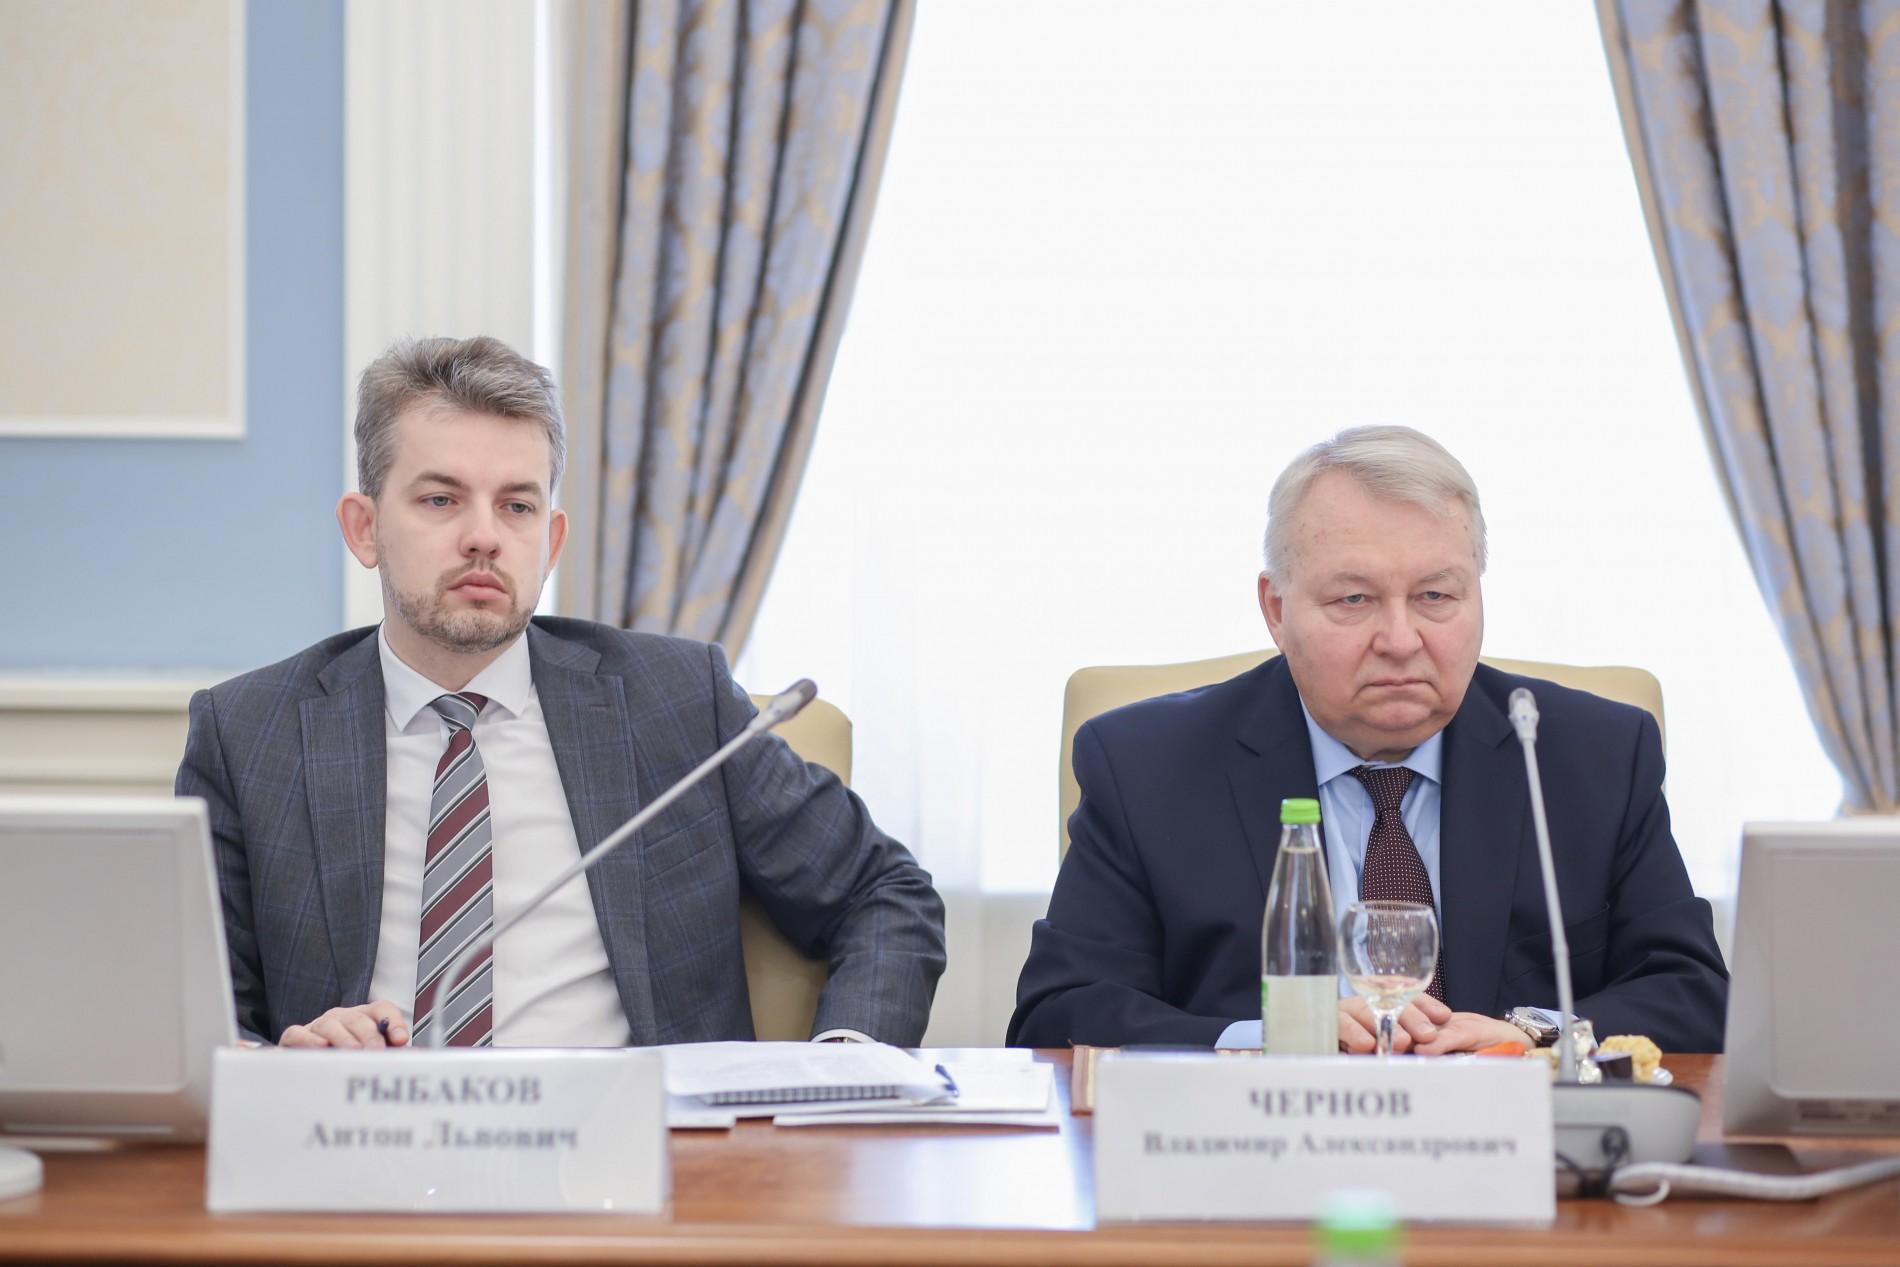 Фото: Media.kpfu.ru